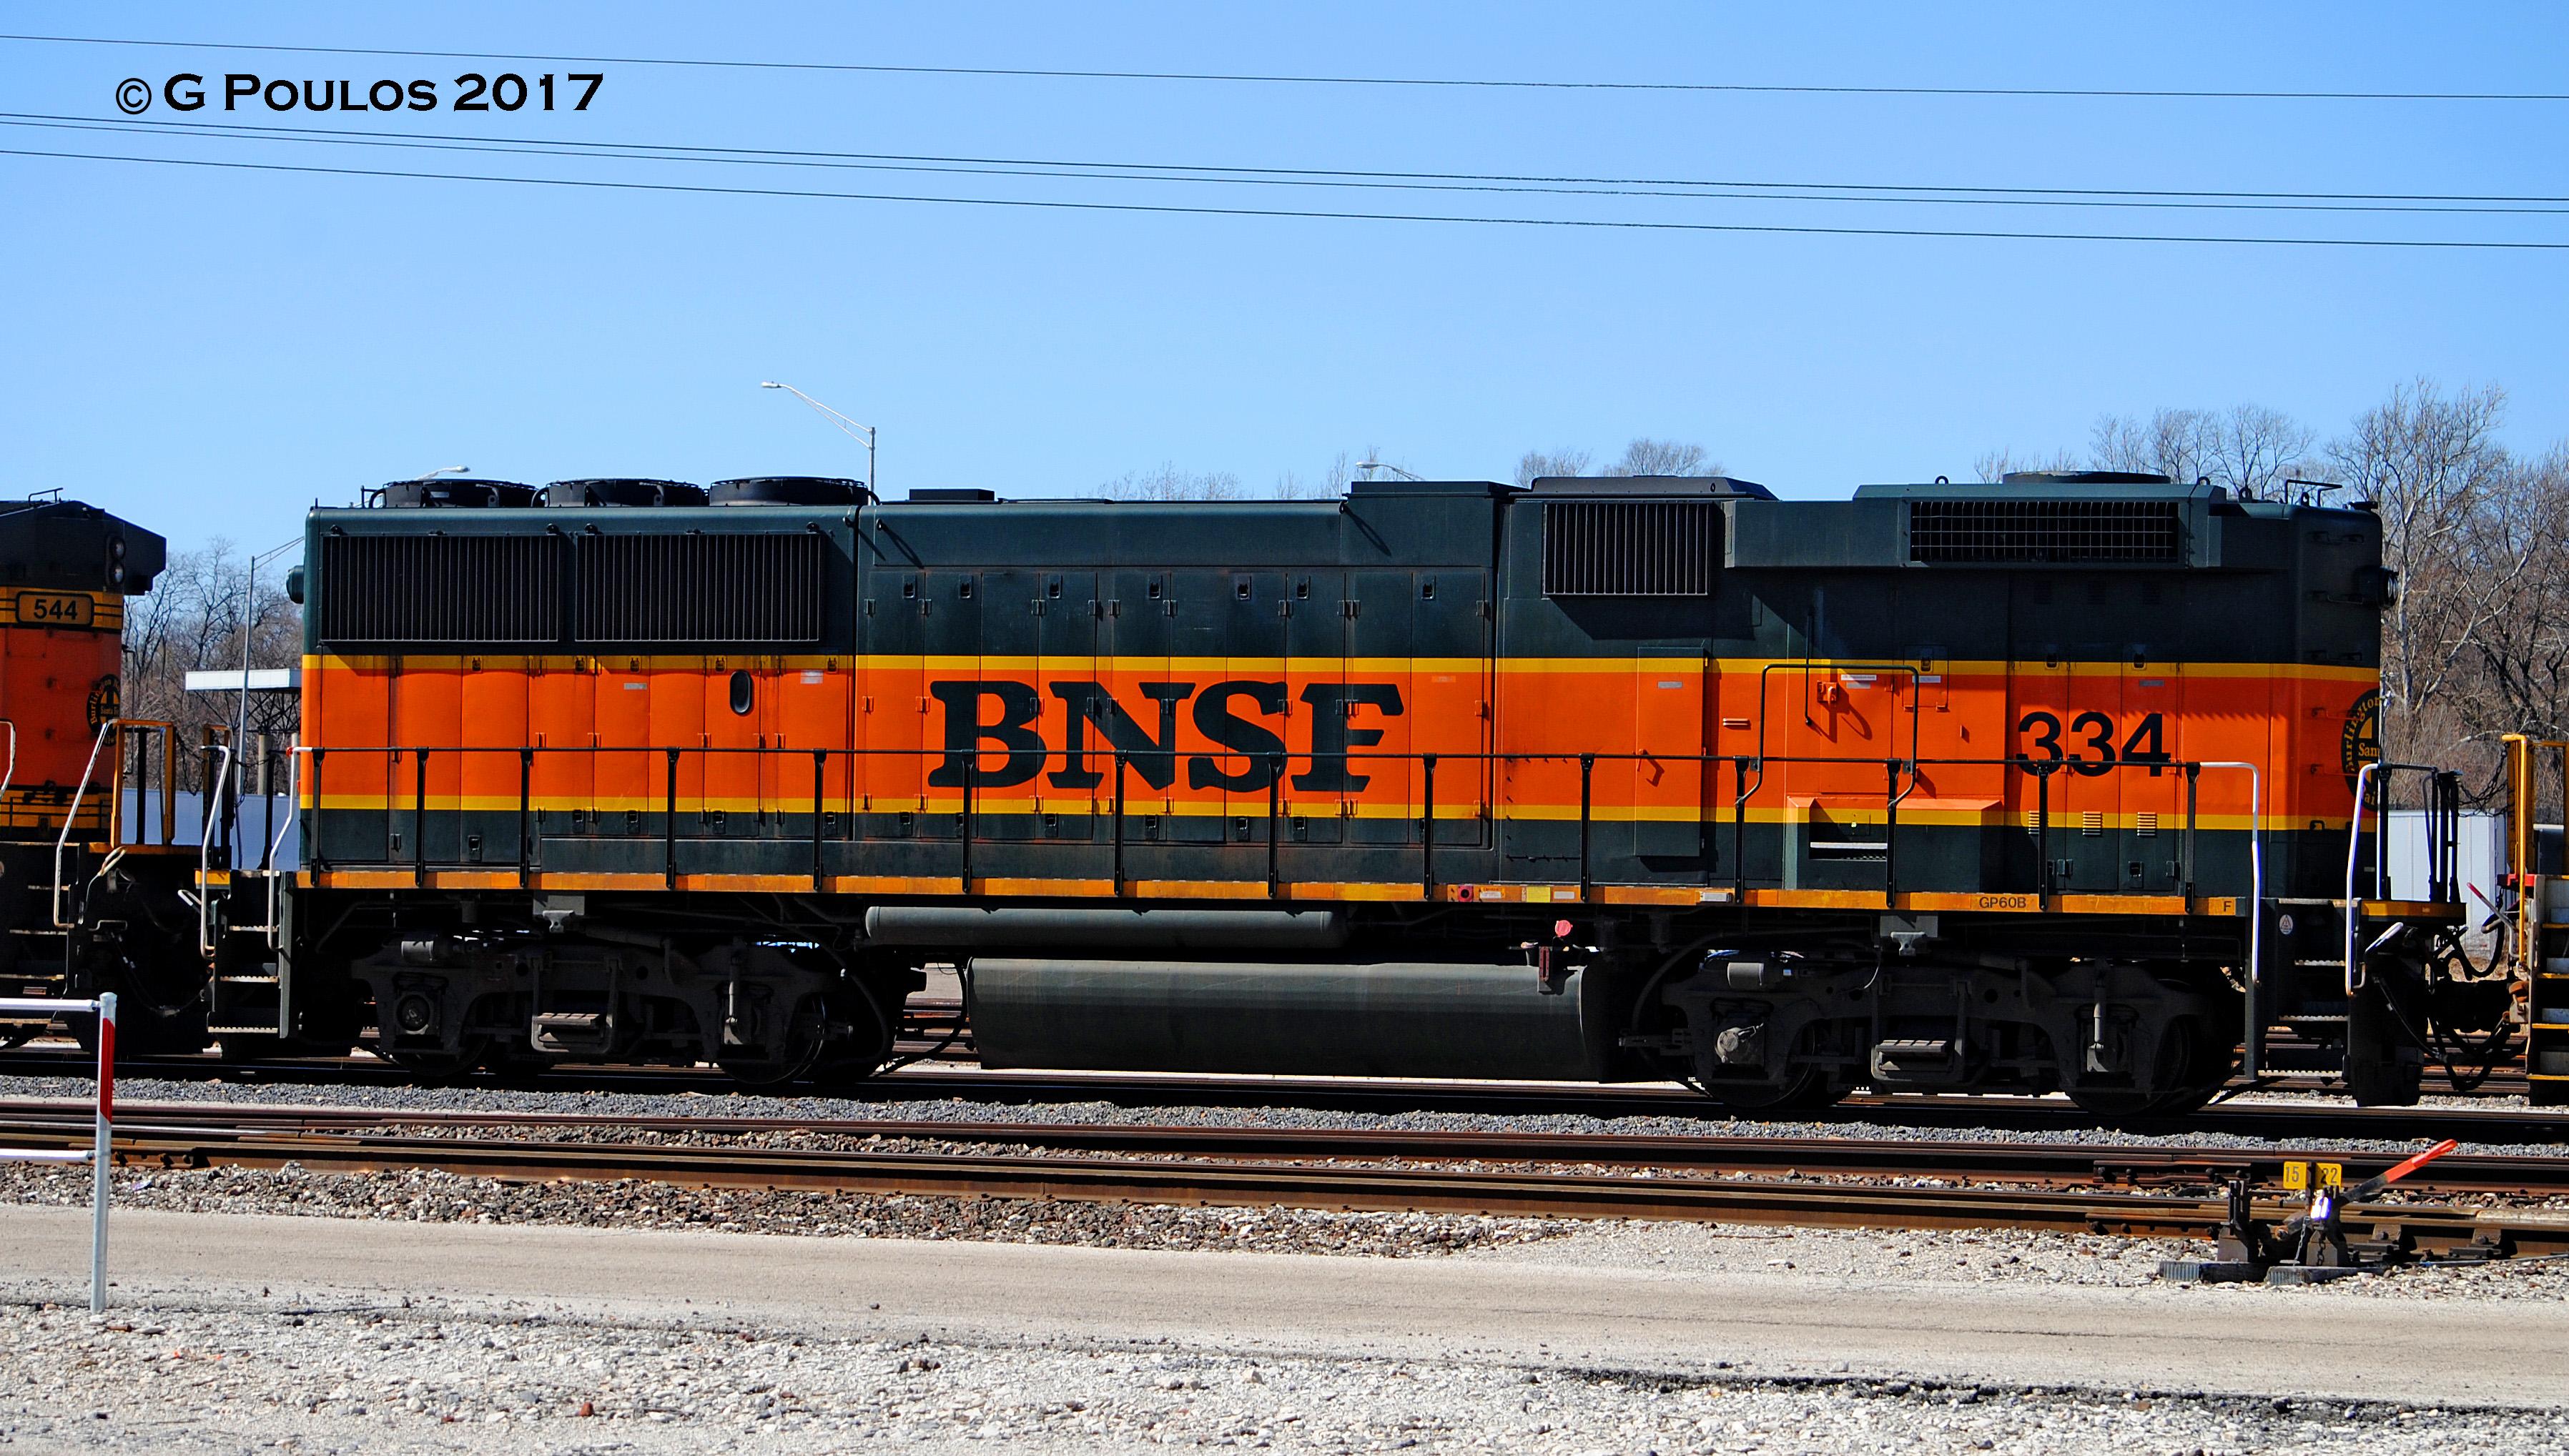 BNSF 334 0007 3-8-17 by eyepilot13